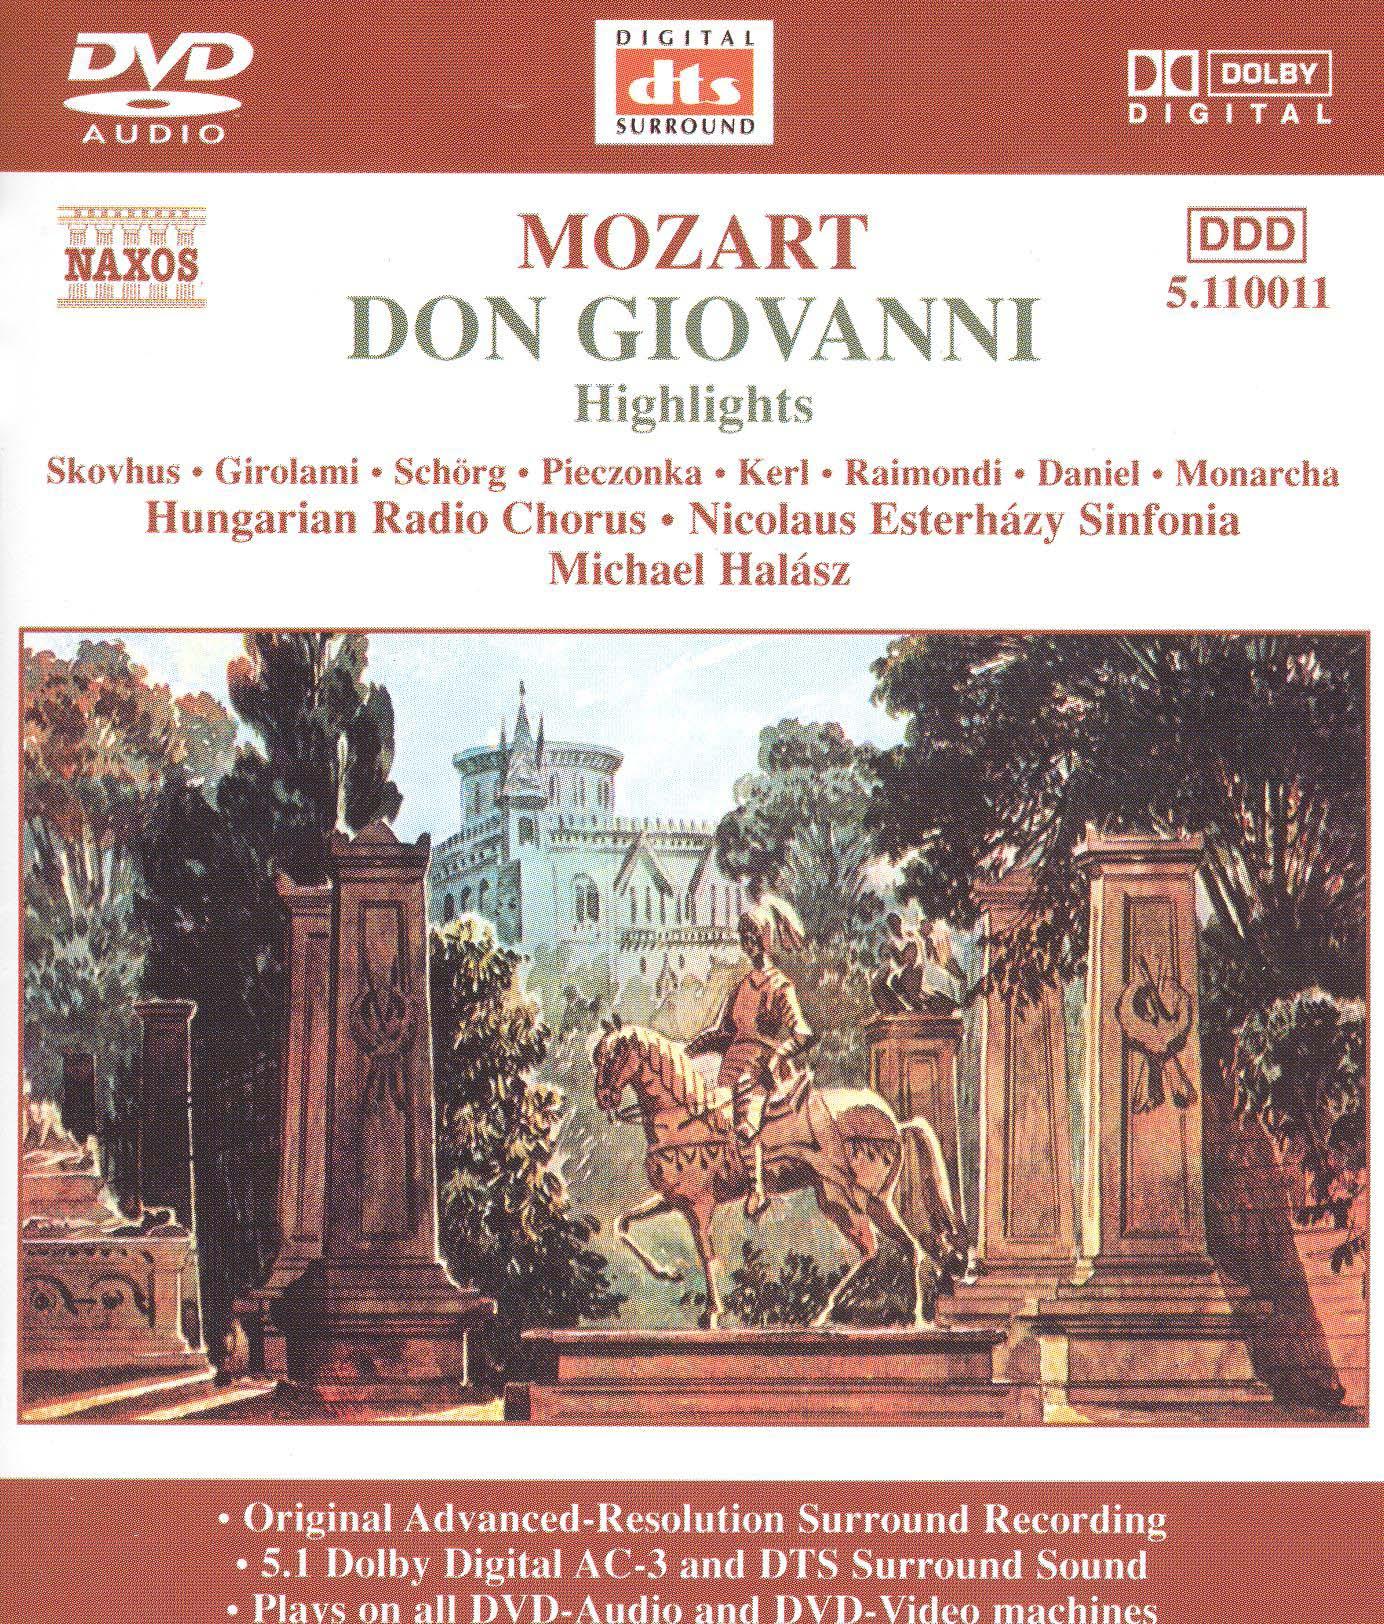 Don Giovanni: Highlights